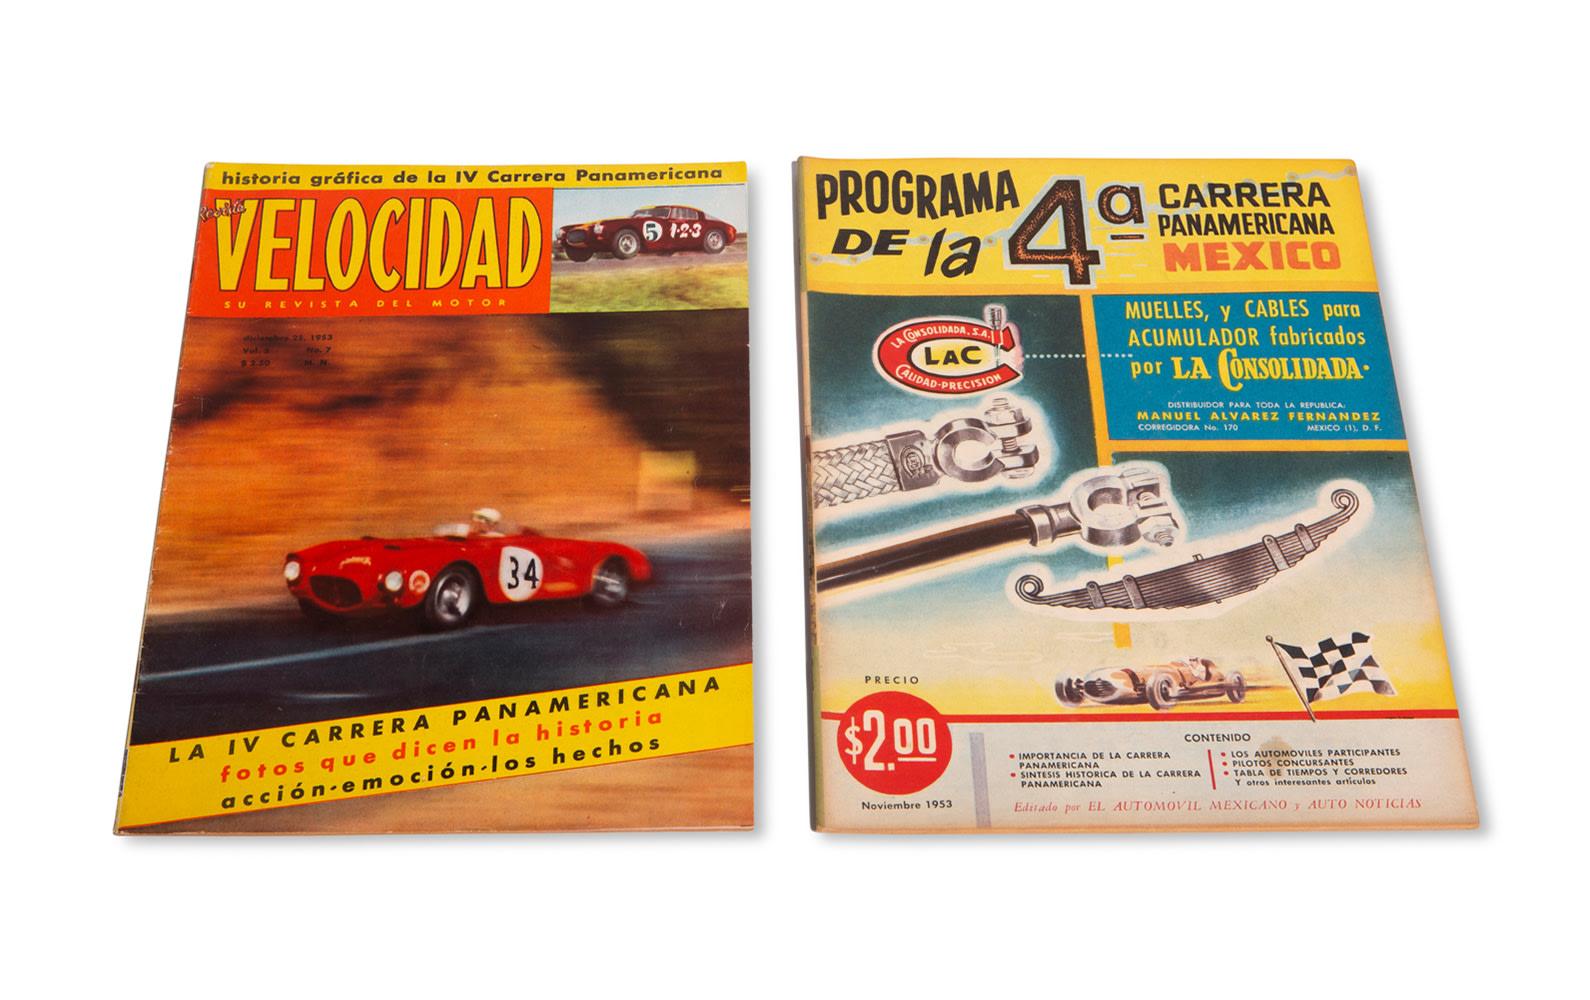 1953 Carrera Panamericana Race Program and Velocidad Magazine